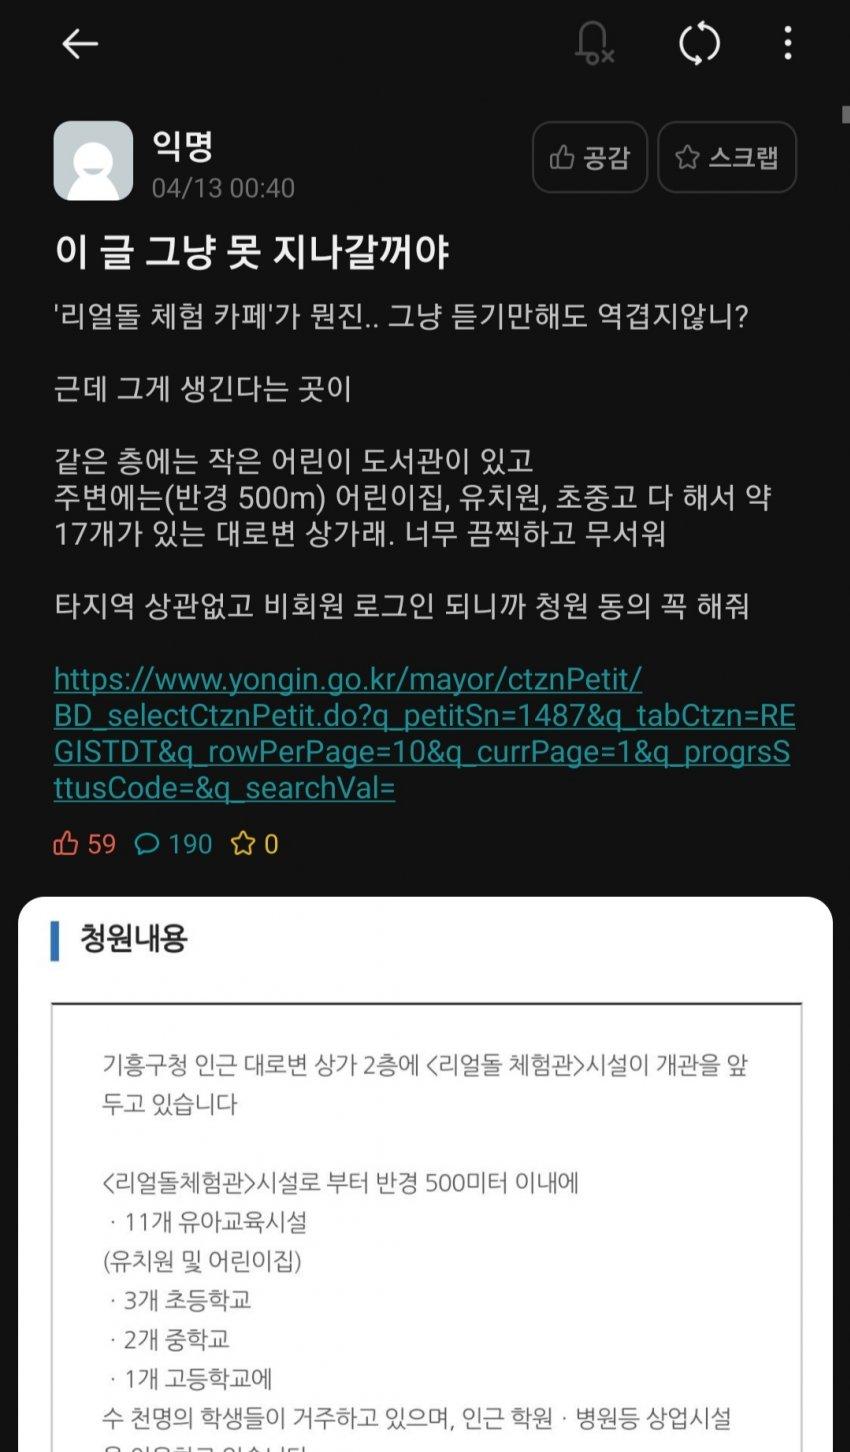 viewimage.php?id=2fbcc323e7d334aa51b1d3a24781&no=24b0d769e1d32ca73fec81fa11d02831b46f6c3837711f4400726c62dd65225b494f192572c78b1b6eb51e1c9c5bf2a520265182530ba815507b456371ea3f393b1f09827b1eb75ce82640c563defeaeeb4d80efdf9b3c4b52d7cf0a7b7fc05a55c5ad381ddff6abccc5a52a281f